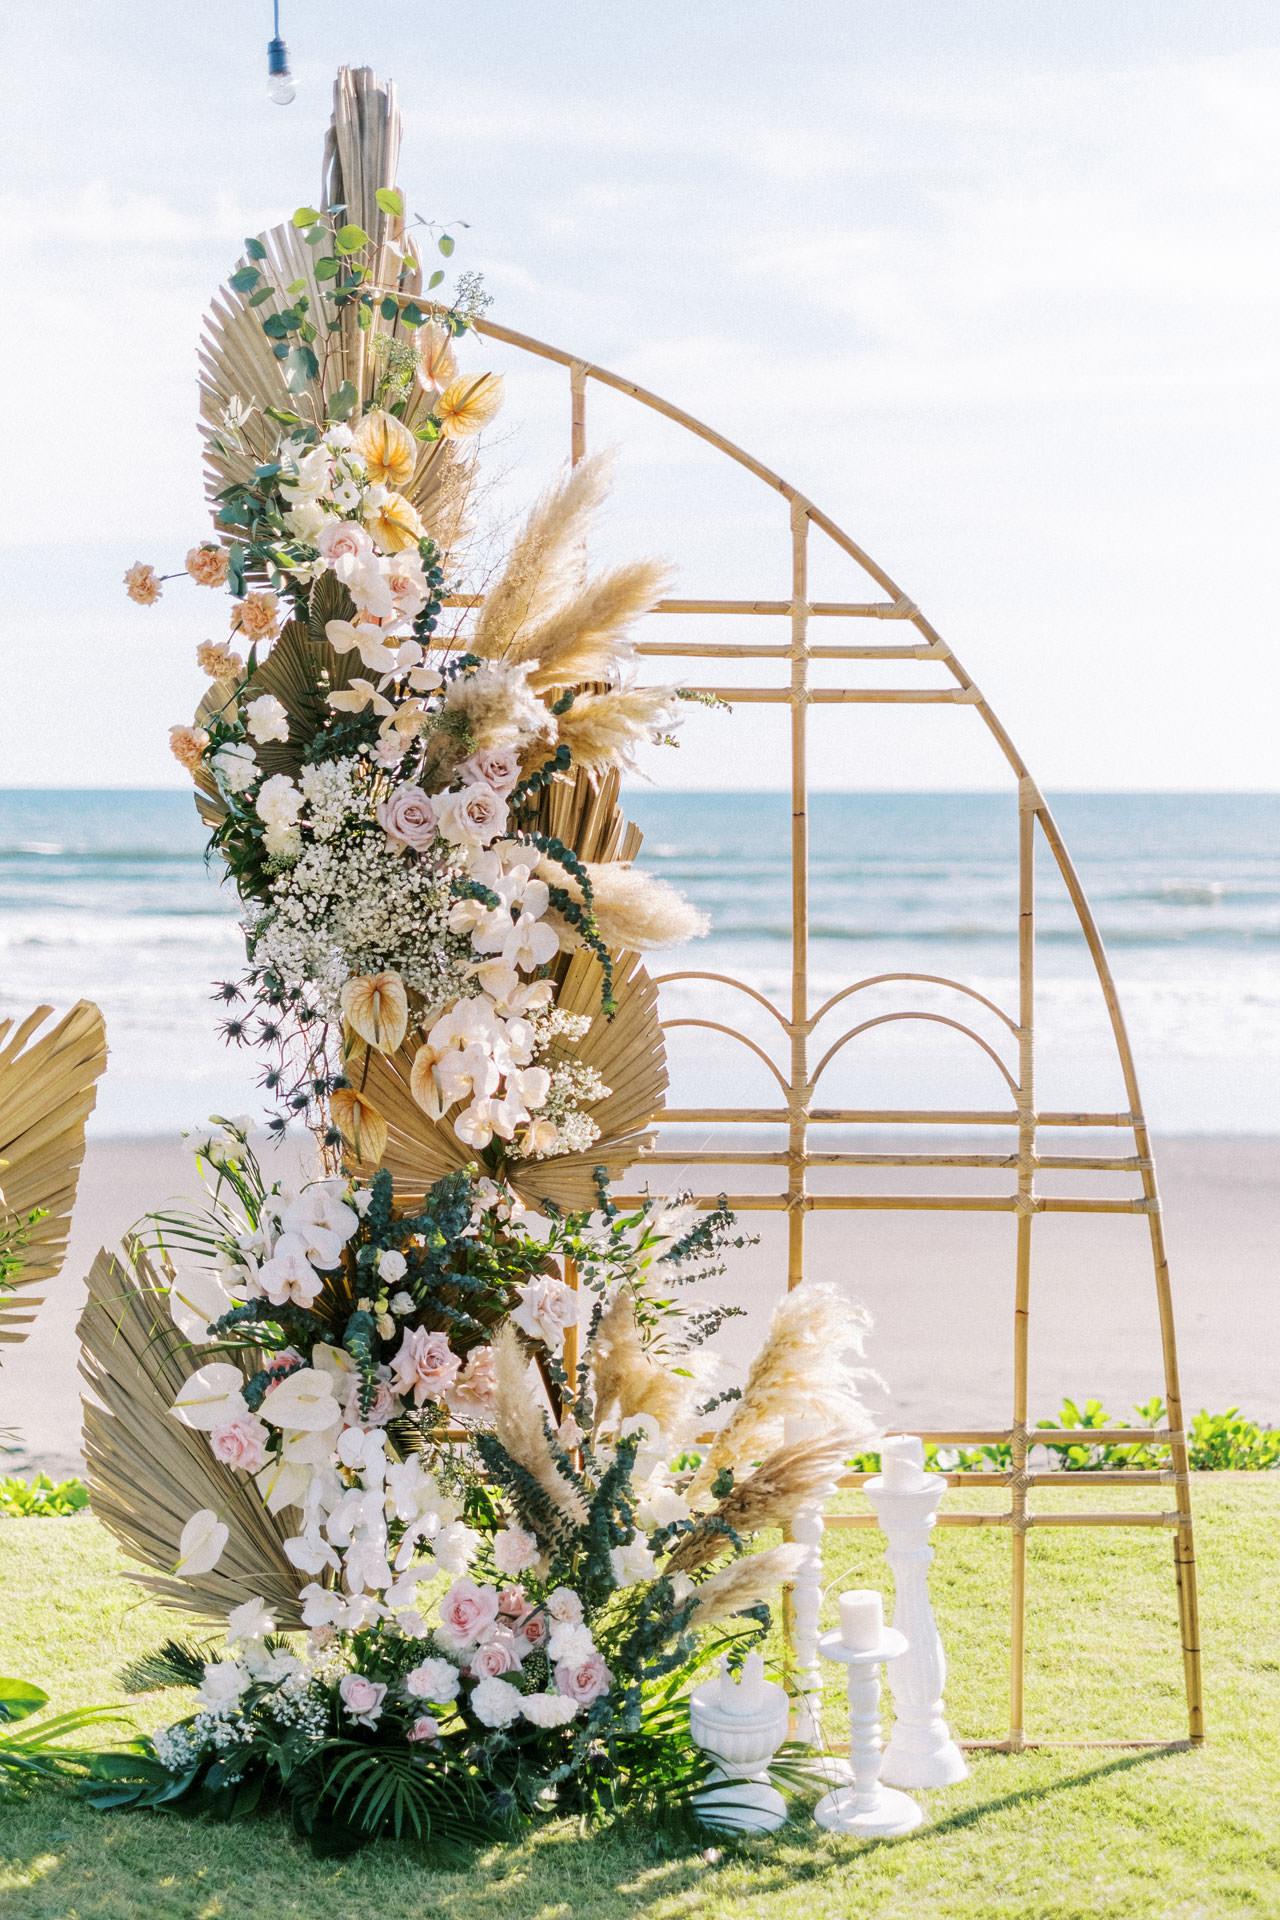 Bali Beach Glamping Wedding on a Luxury Tent 13